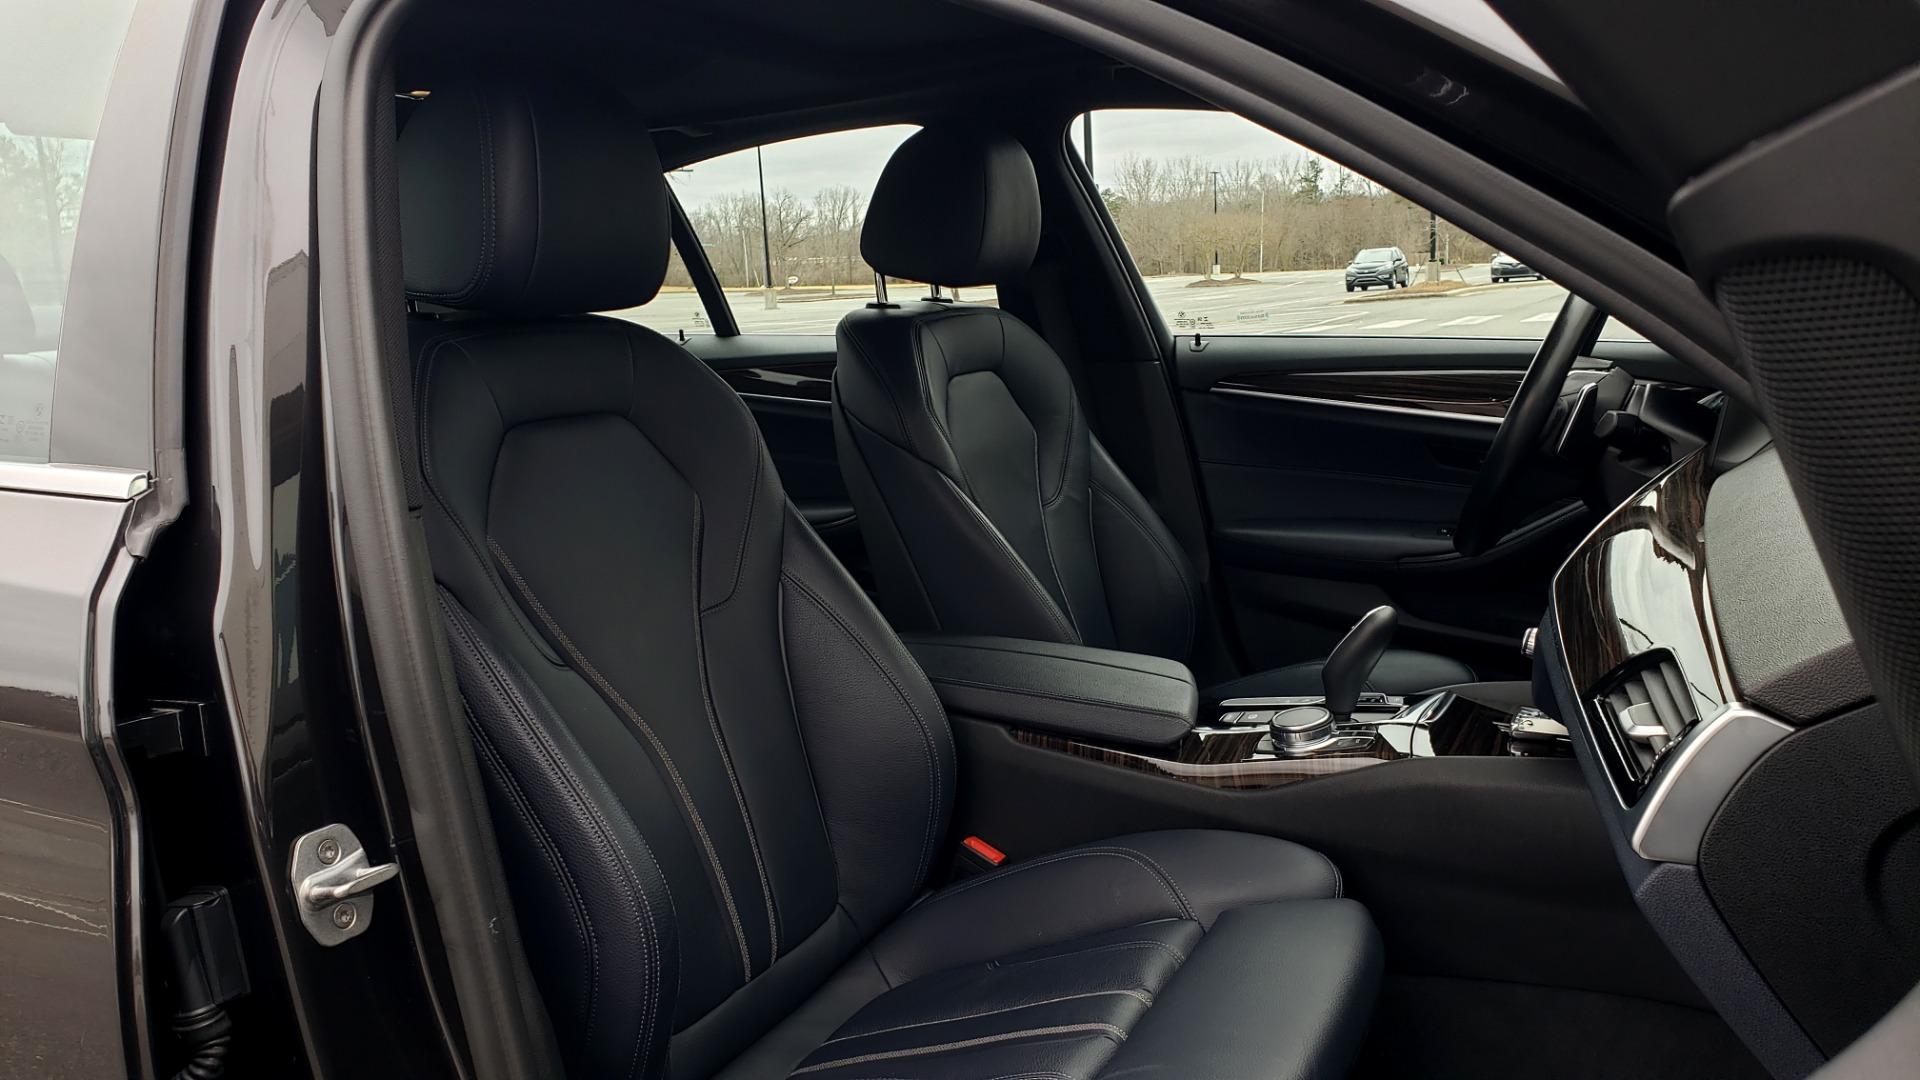 Used 2017 BMW 5 SERIES 530IXDRIVE / PREM PKG / DRVR ASST PLUS / CLD WTHR / APPLE CARPLAY for sale $30,595 at Formula Imports in Charlotte NC 28227 68